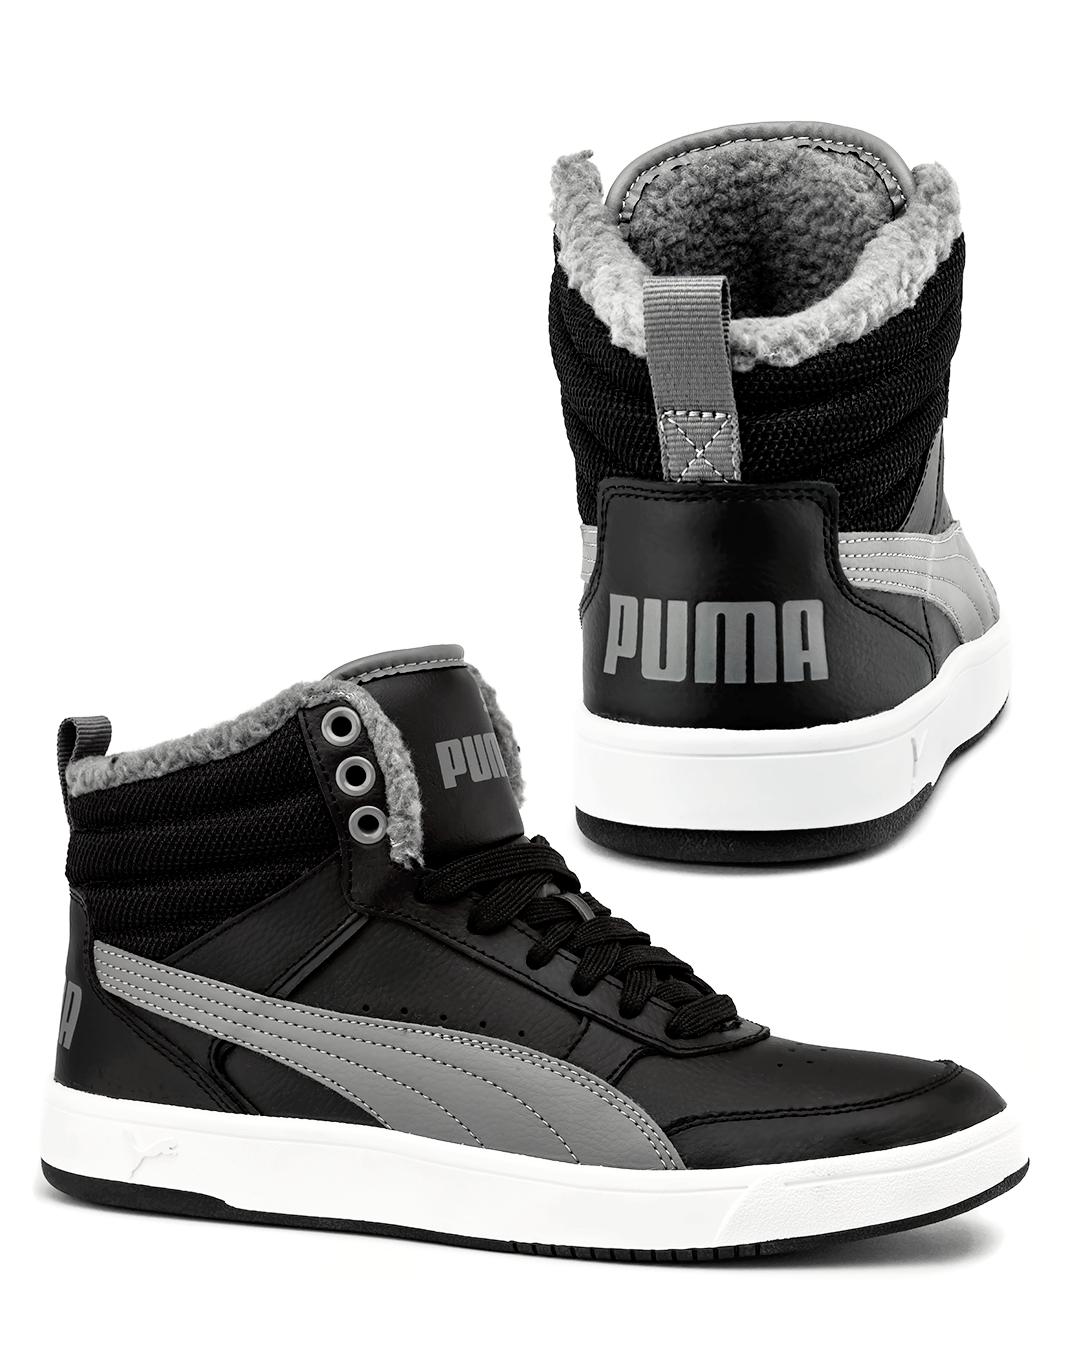 puma-botas-zapatillas-sneakers-ecommerce-amazom-photoshoot-commercial-product-photo-fotografia-producto-fotografo-Sr-Erreka-films-photo-tabletop-spain-costa-del-sol-malaga-madrid.png